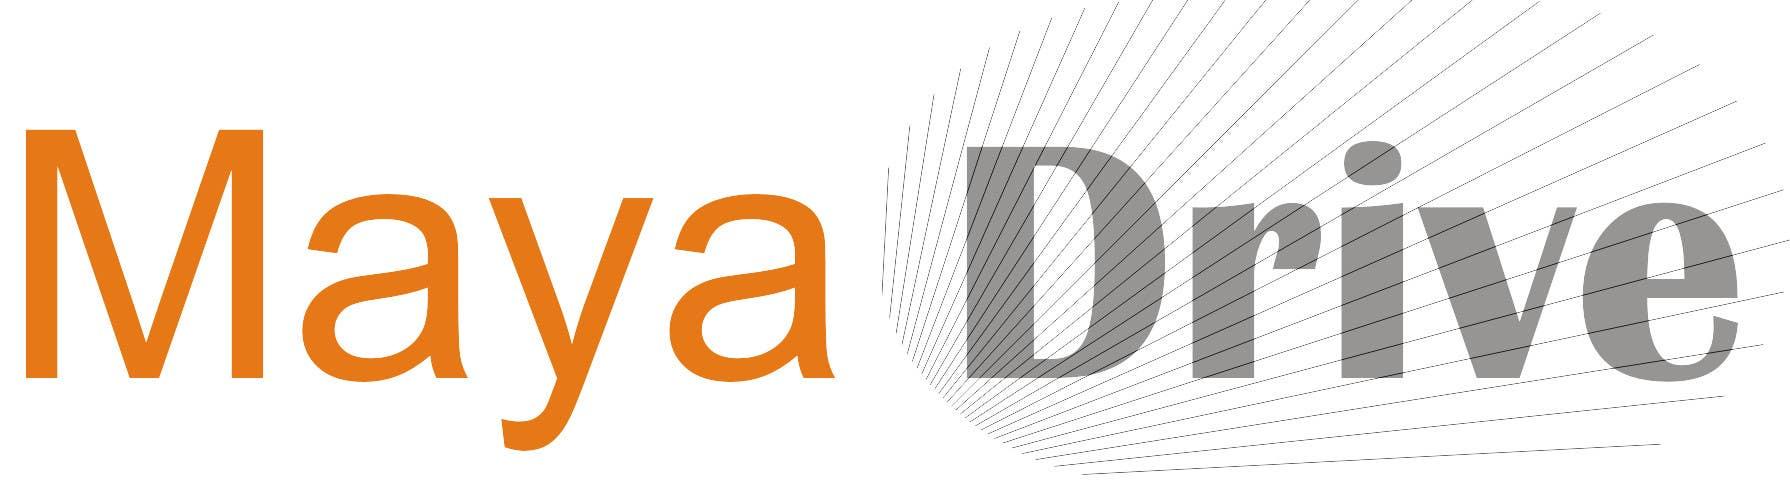 Bài tham dự cuộc thi #                                        19                                      cho                                         Design a Logo for Windows Network Application / Site